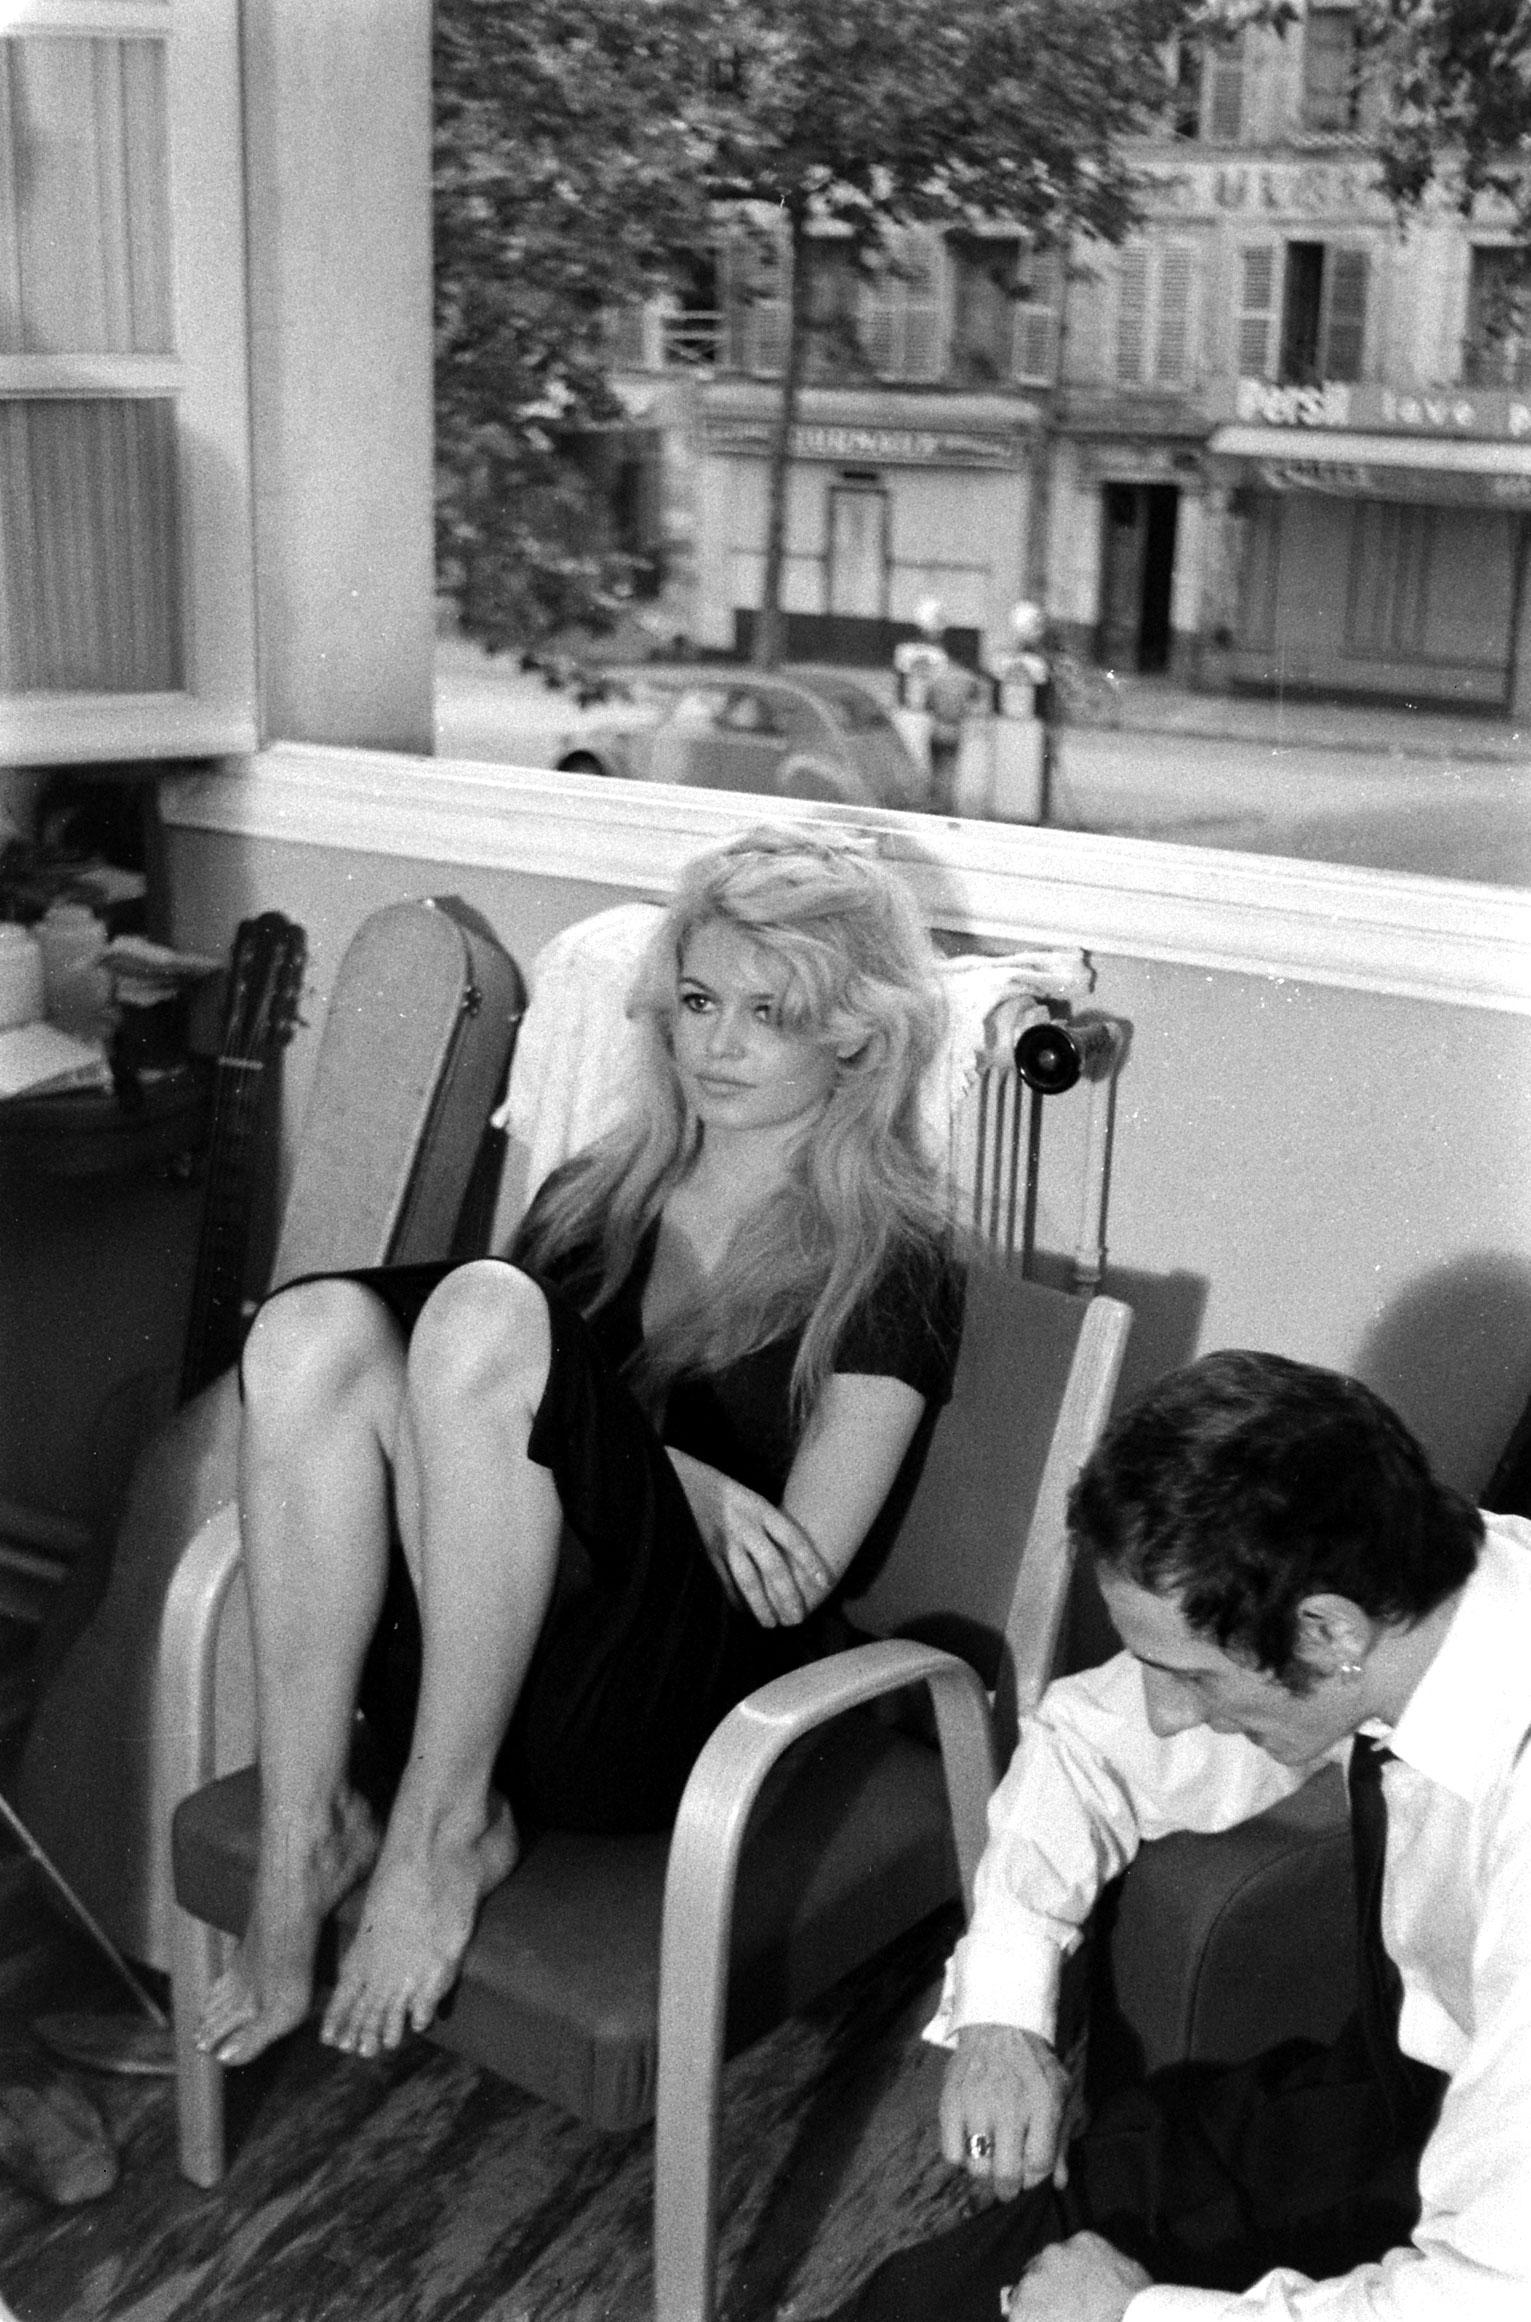 Brigitte Bardot on the set of the film, <i>La Femme et le Pantin</i>, Spain, 1958.